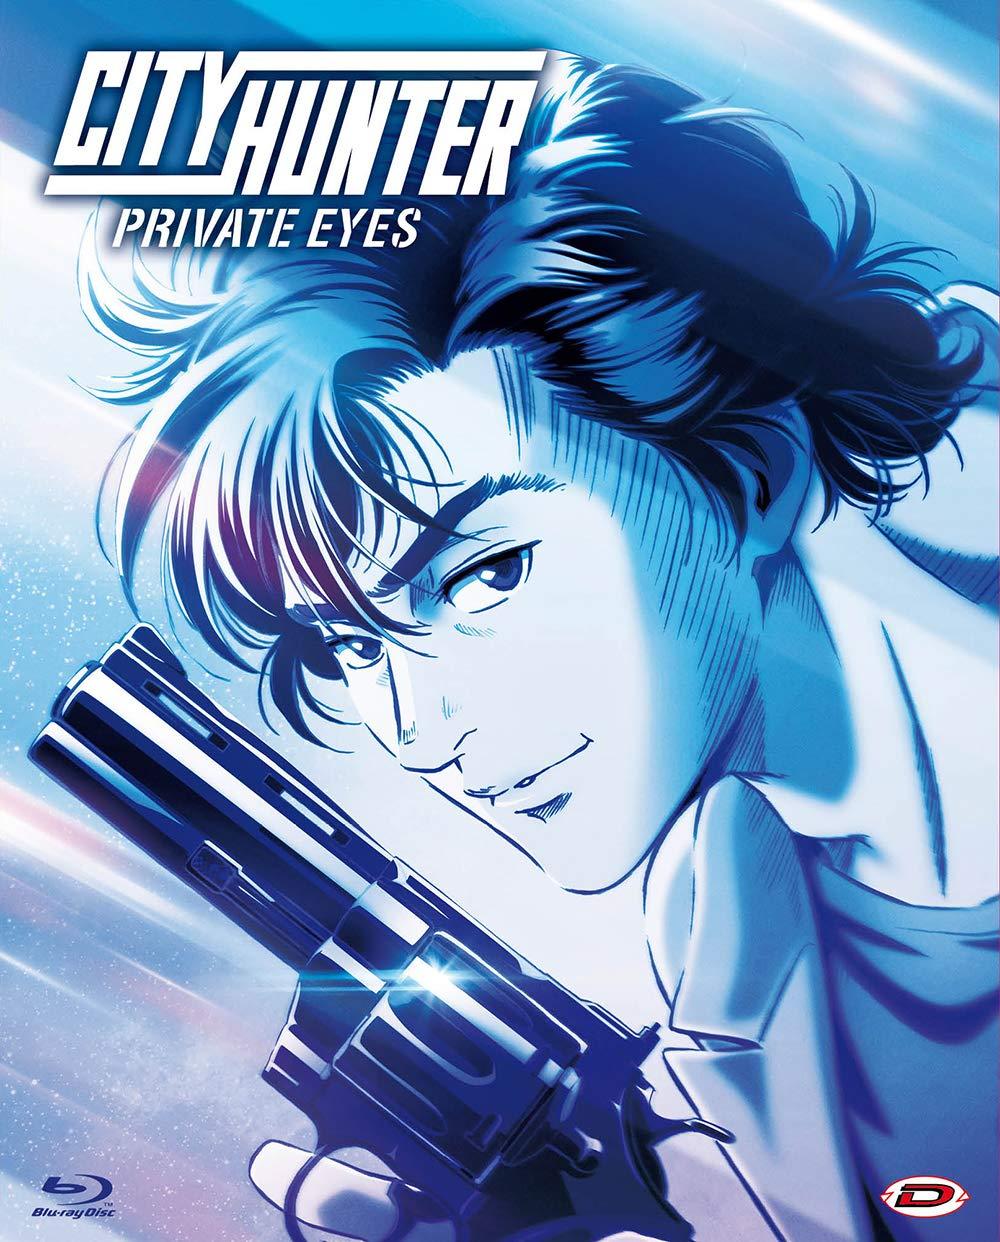 City Hunter - Private Eyes (First Press) (1 BLU-RAY): Amazon.de: DVD &  Blu-ray